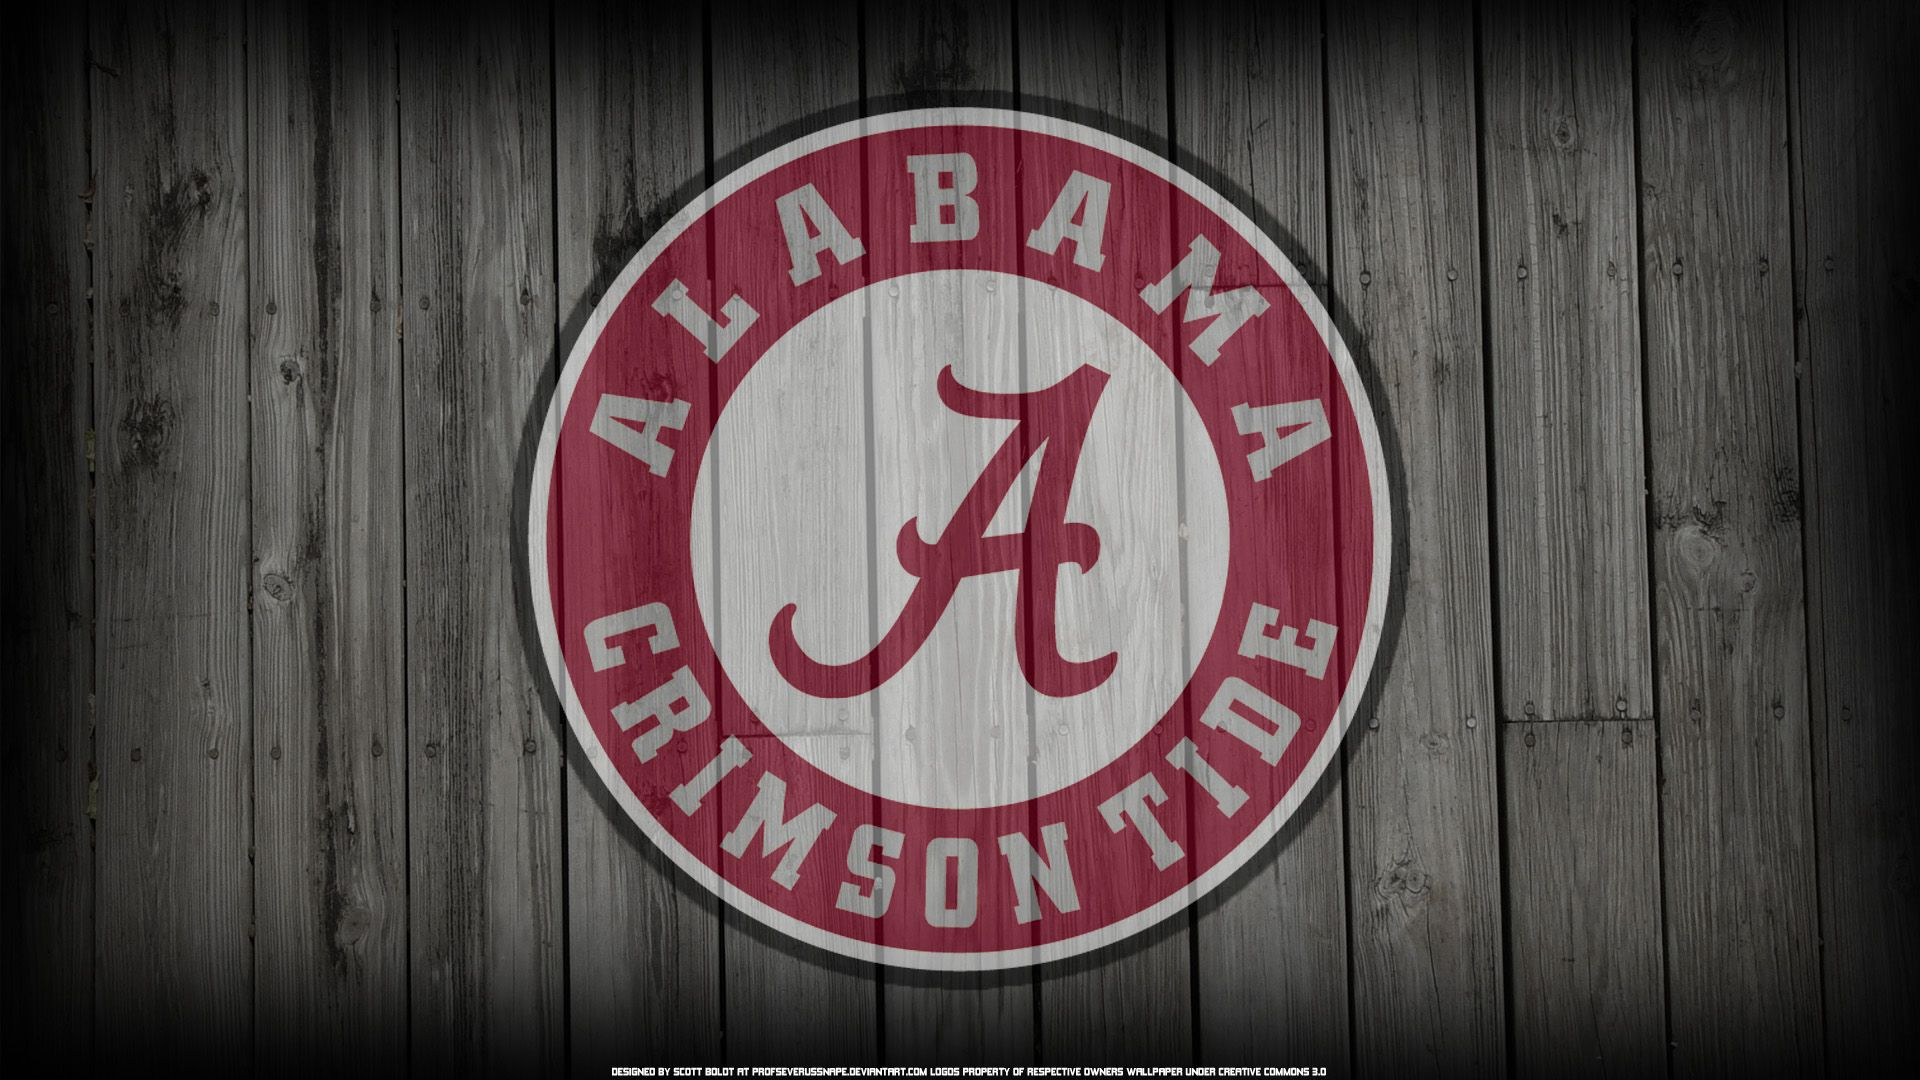 Alabama Crimson Tide Logo on Wood Background (by